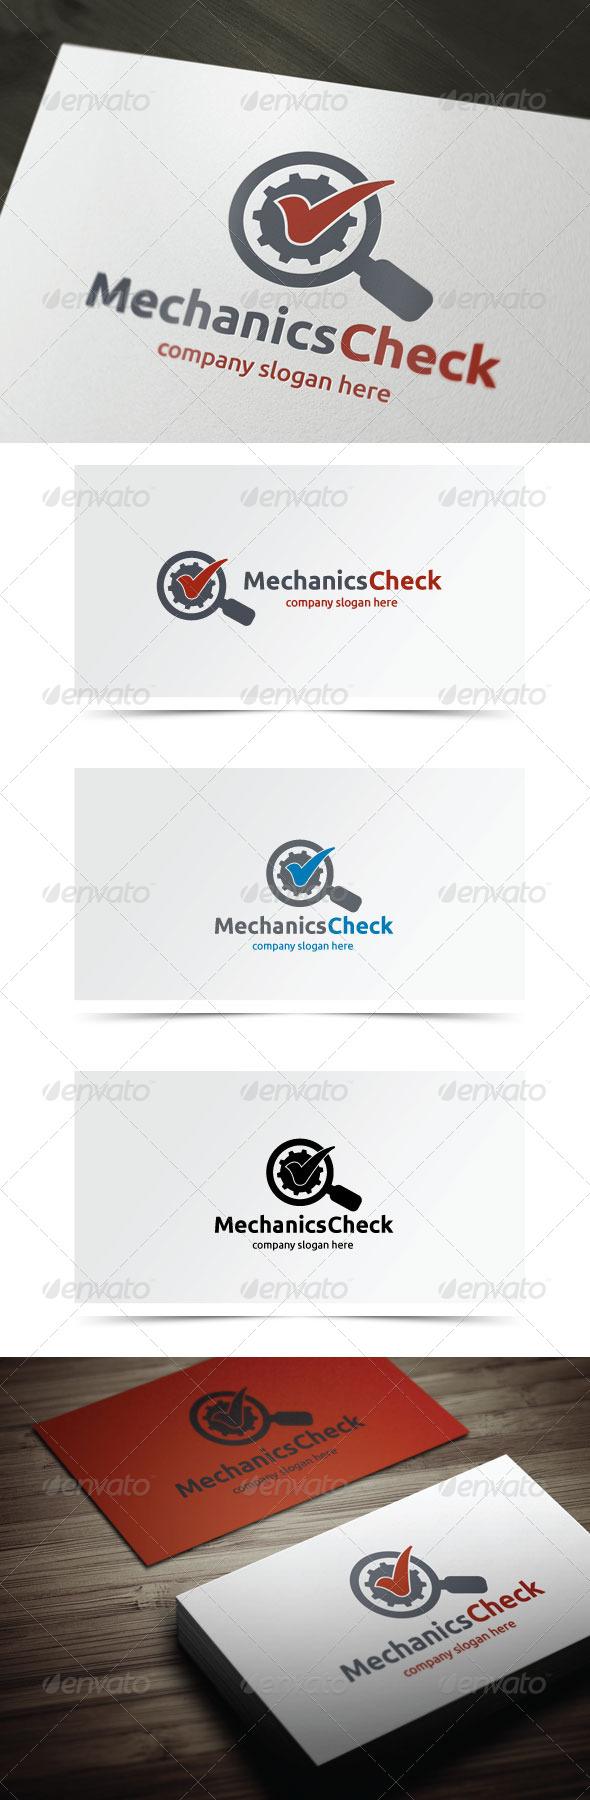 GraphicRiver Mechanics Check 6059224